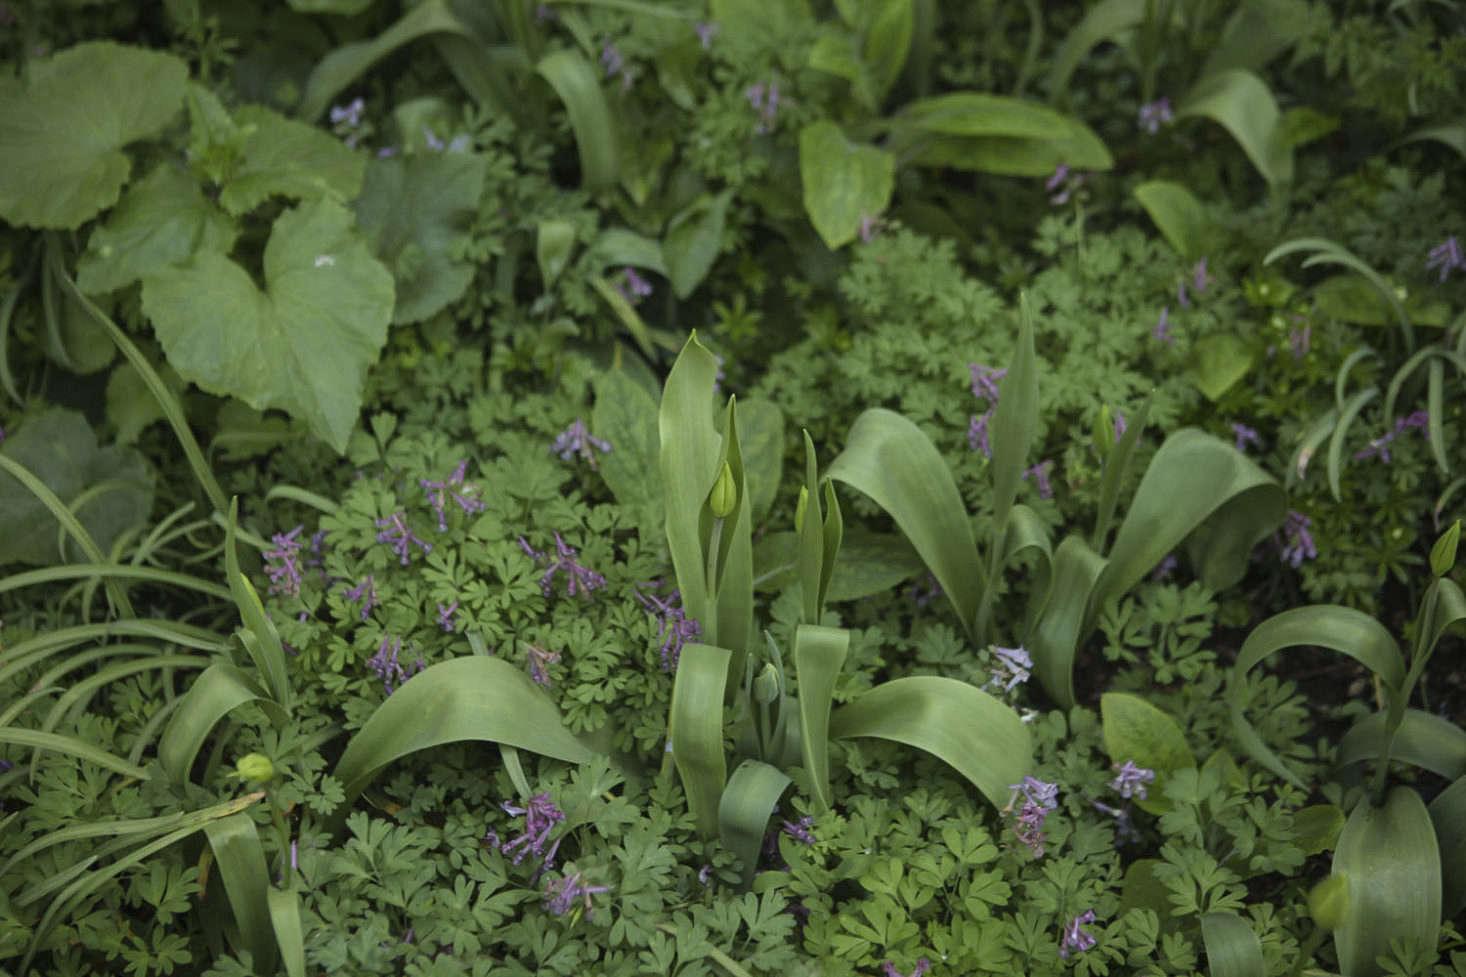 Corydalis solida (fumewort) at the Oxford Botanic Garden.